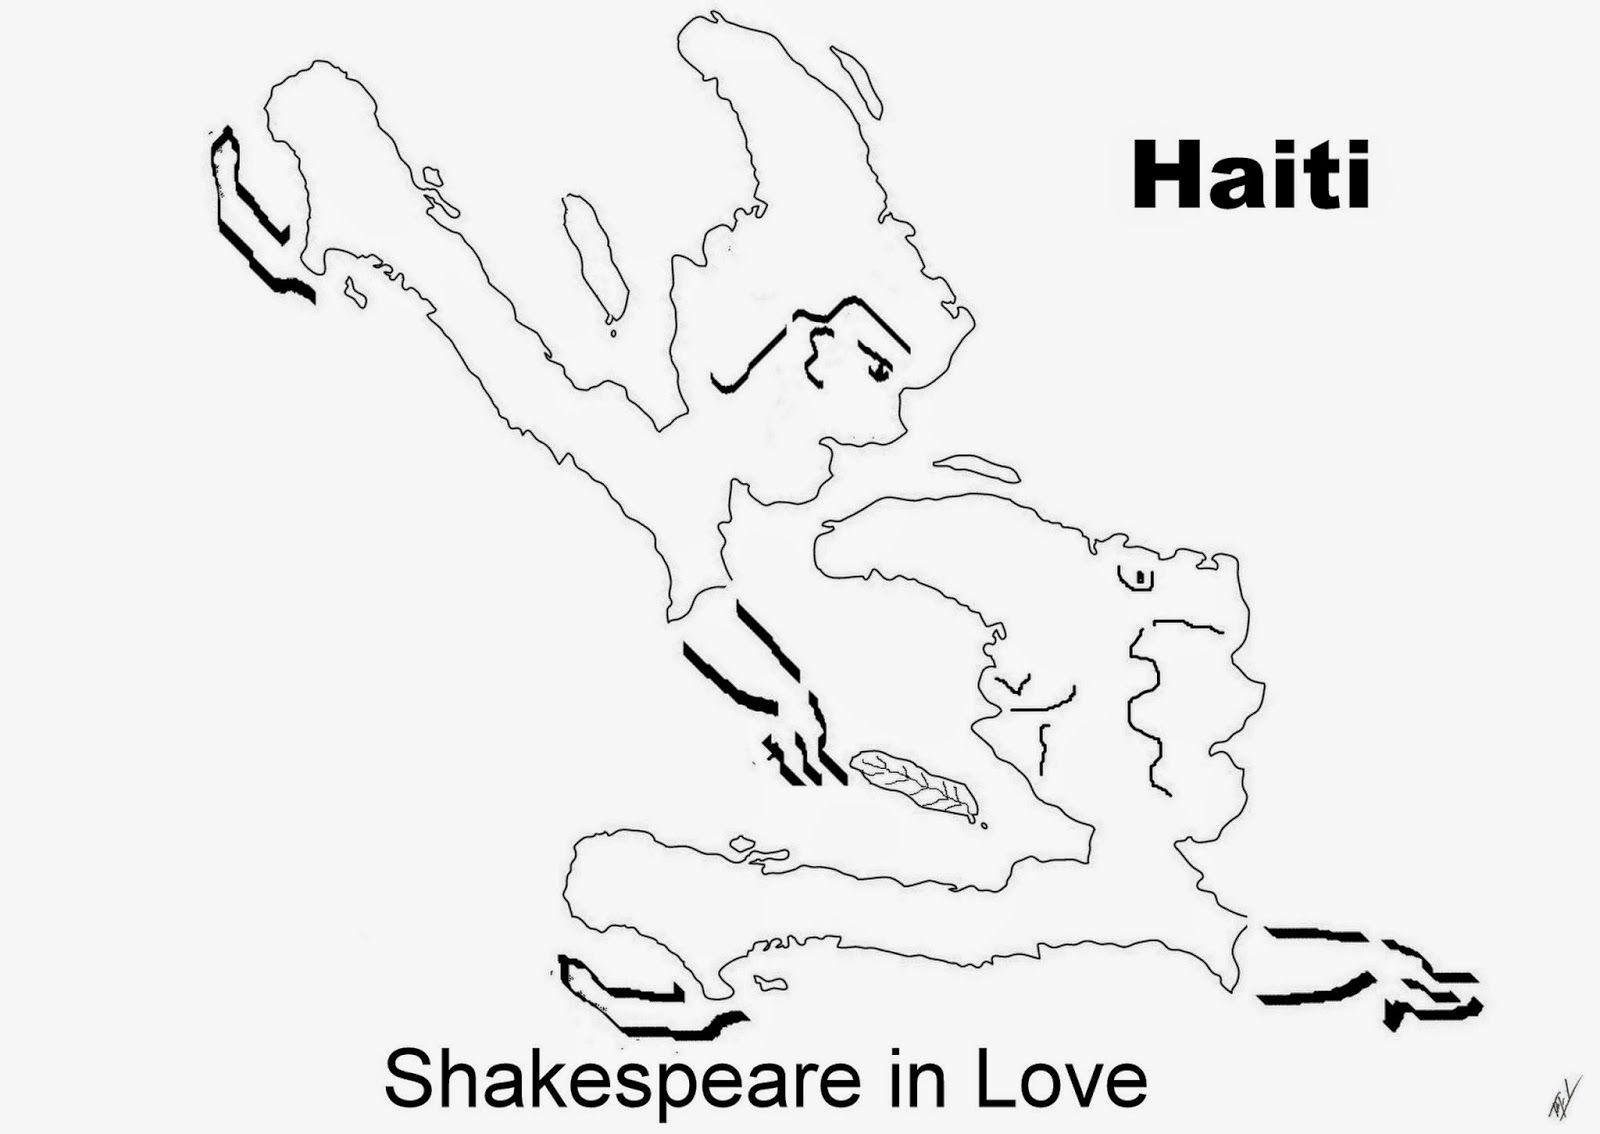 A funny map of Haiti